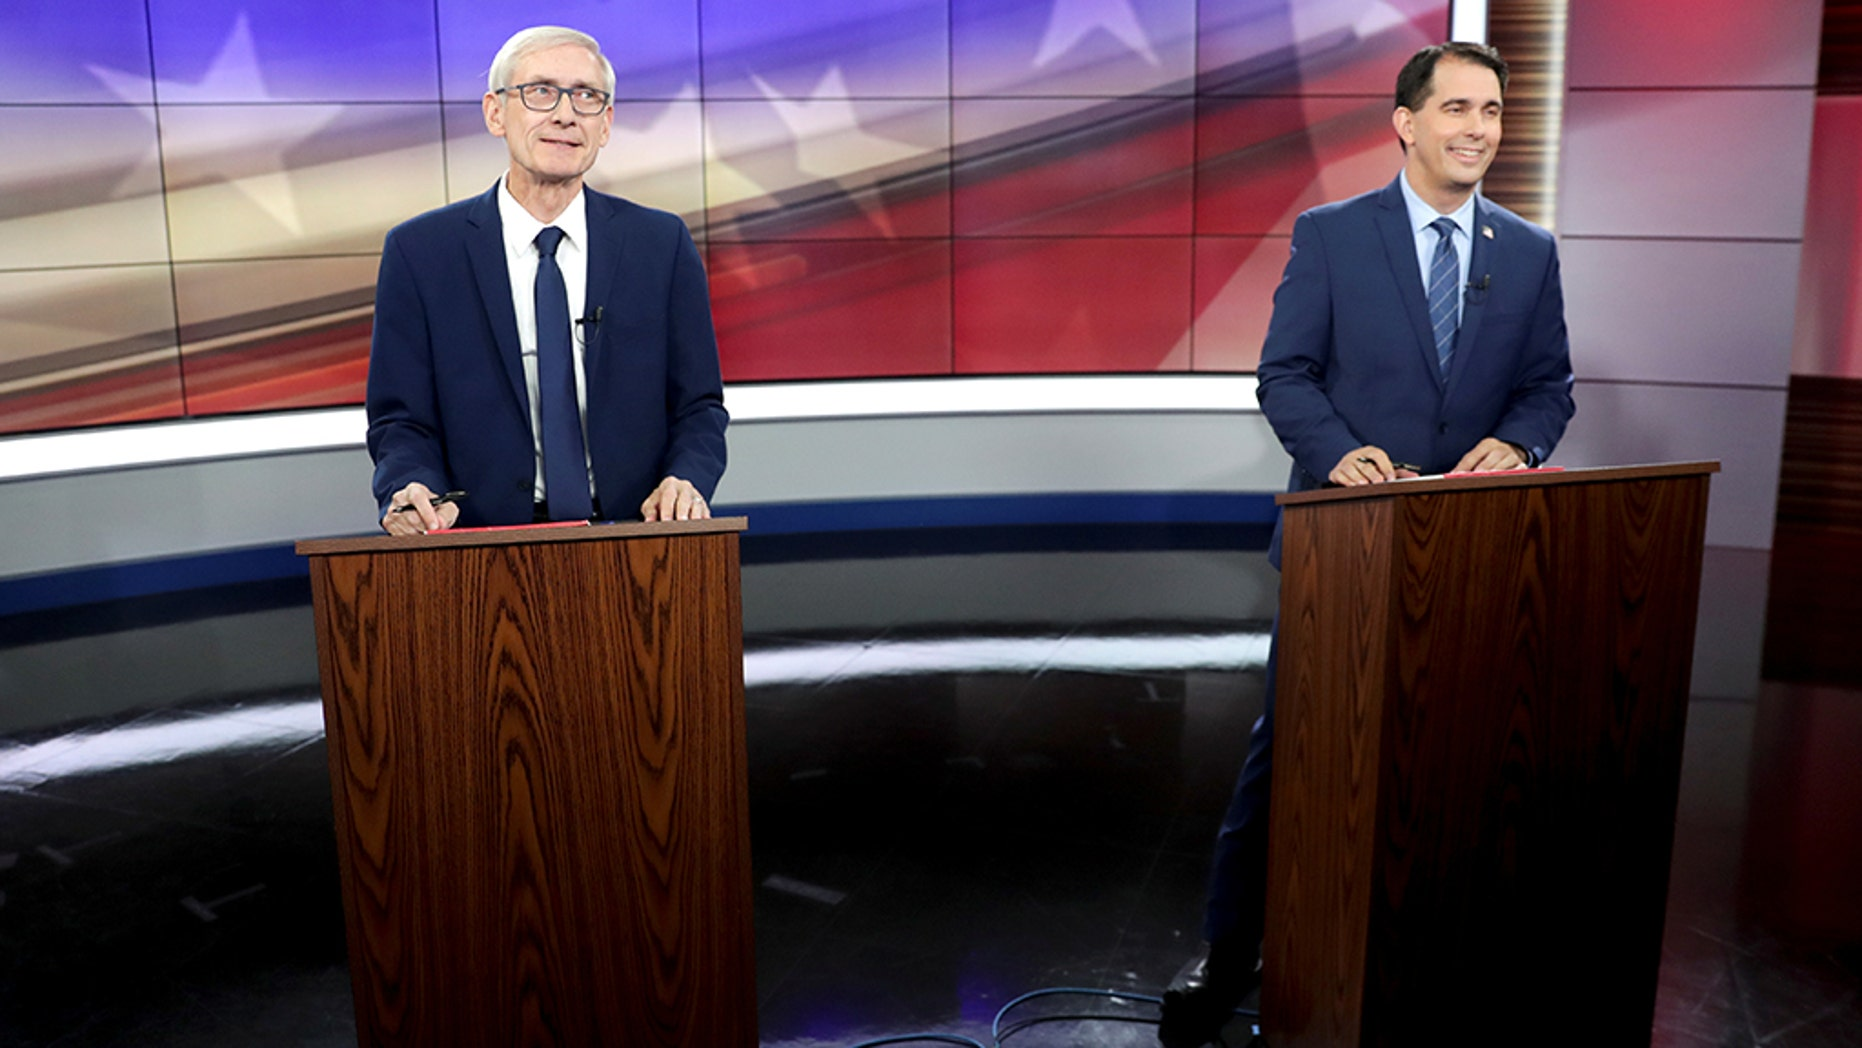 Democratic challenger Tony Evers (L) and Wisconsin Gov. Scott Walker (R). (Steve Apps/Wisconsin State Journal/Pool via REUTERS)